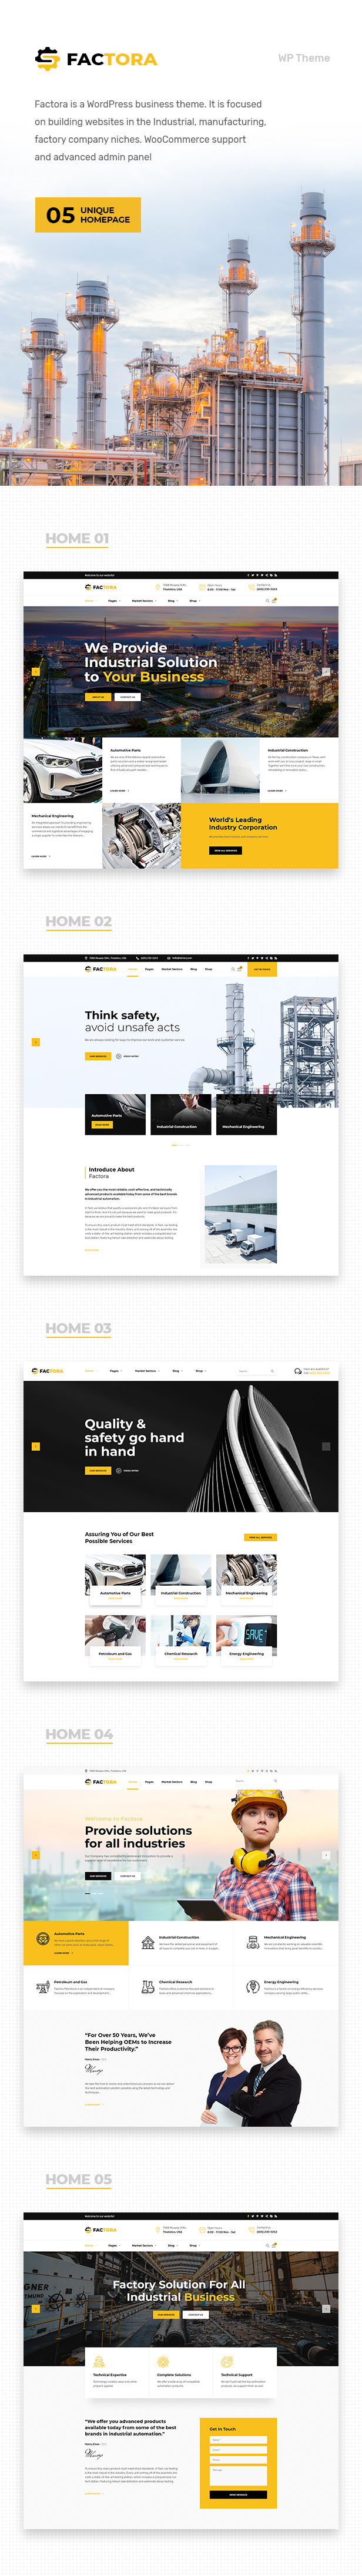 Factora - Fabrik, Industrie Geschäft WordPress Theme - 1